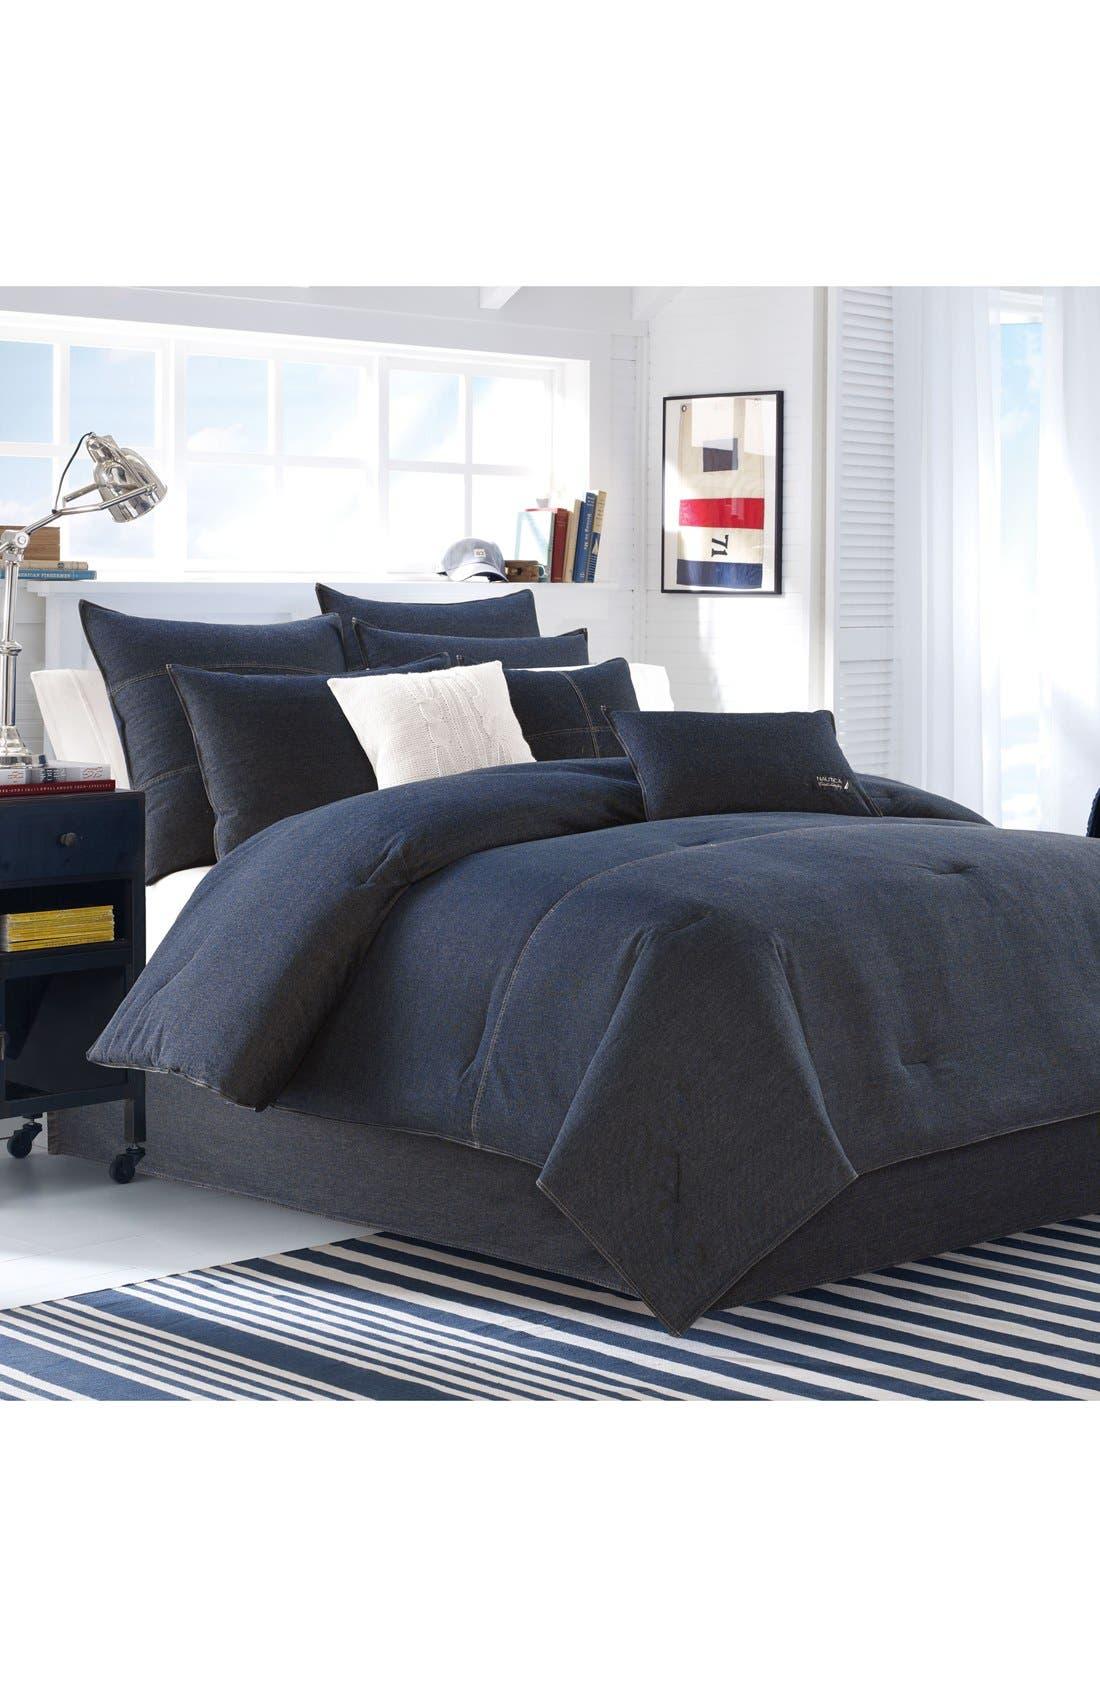 Nautica 'Seaward' Bedding Collection